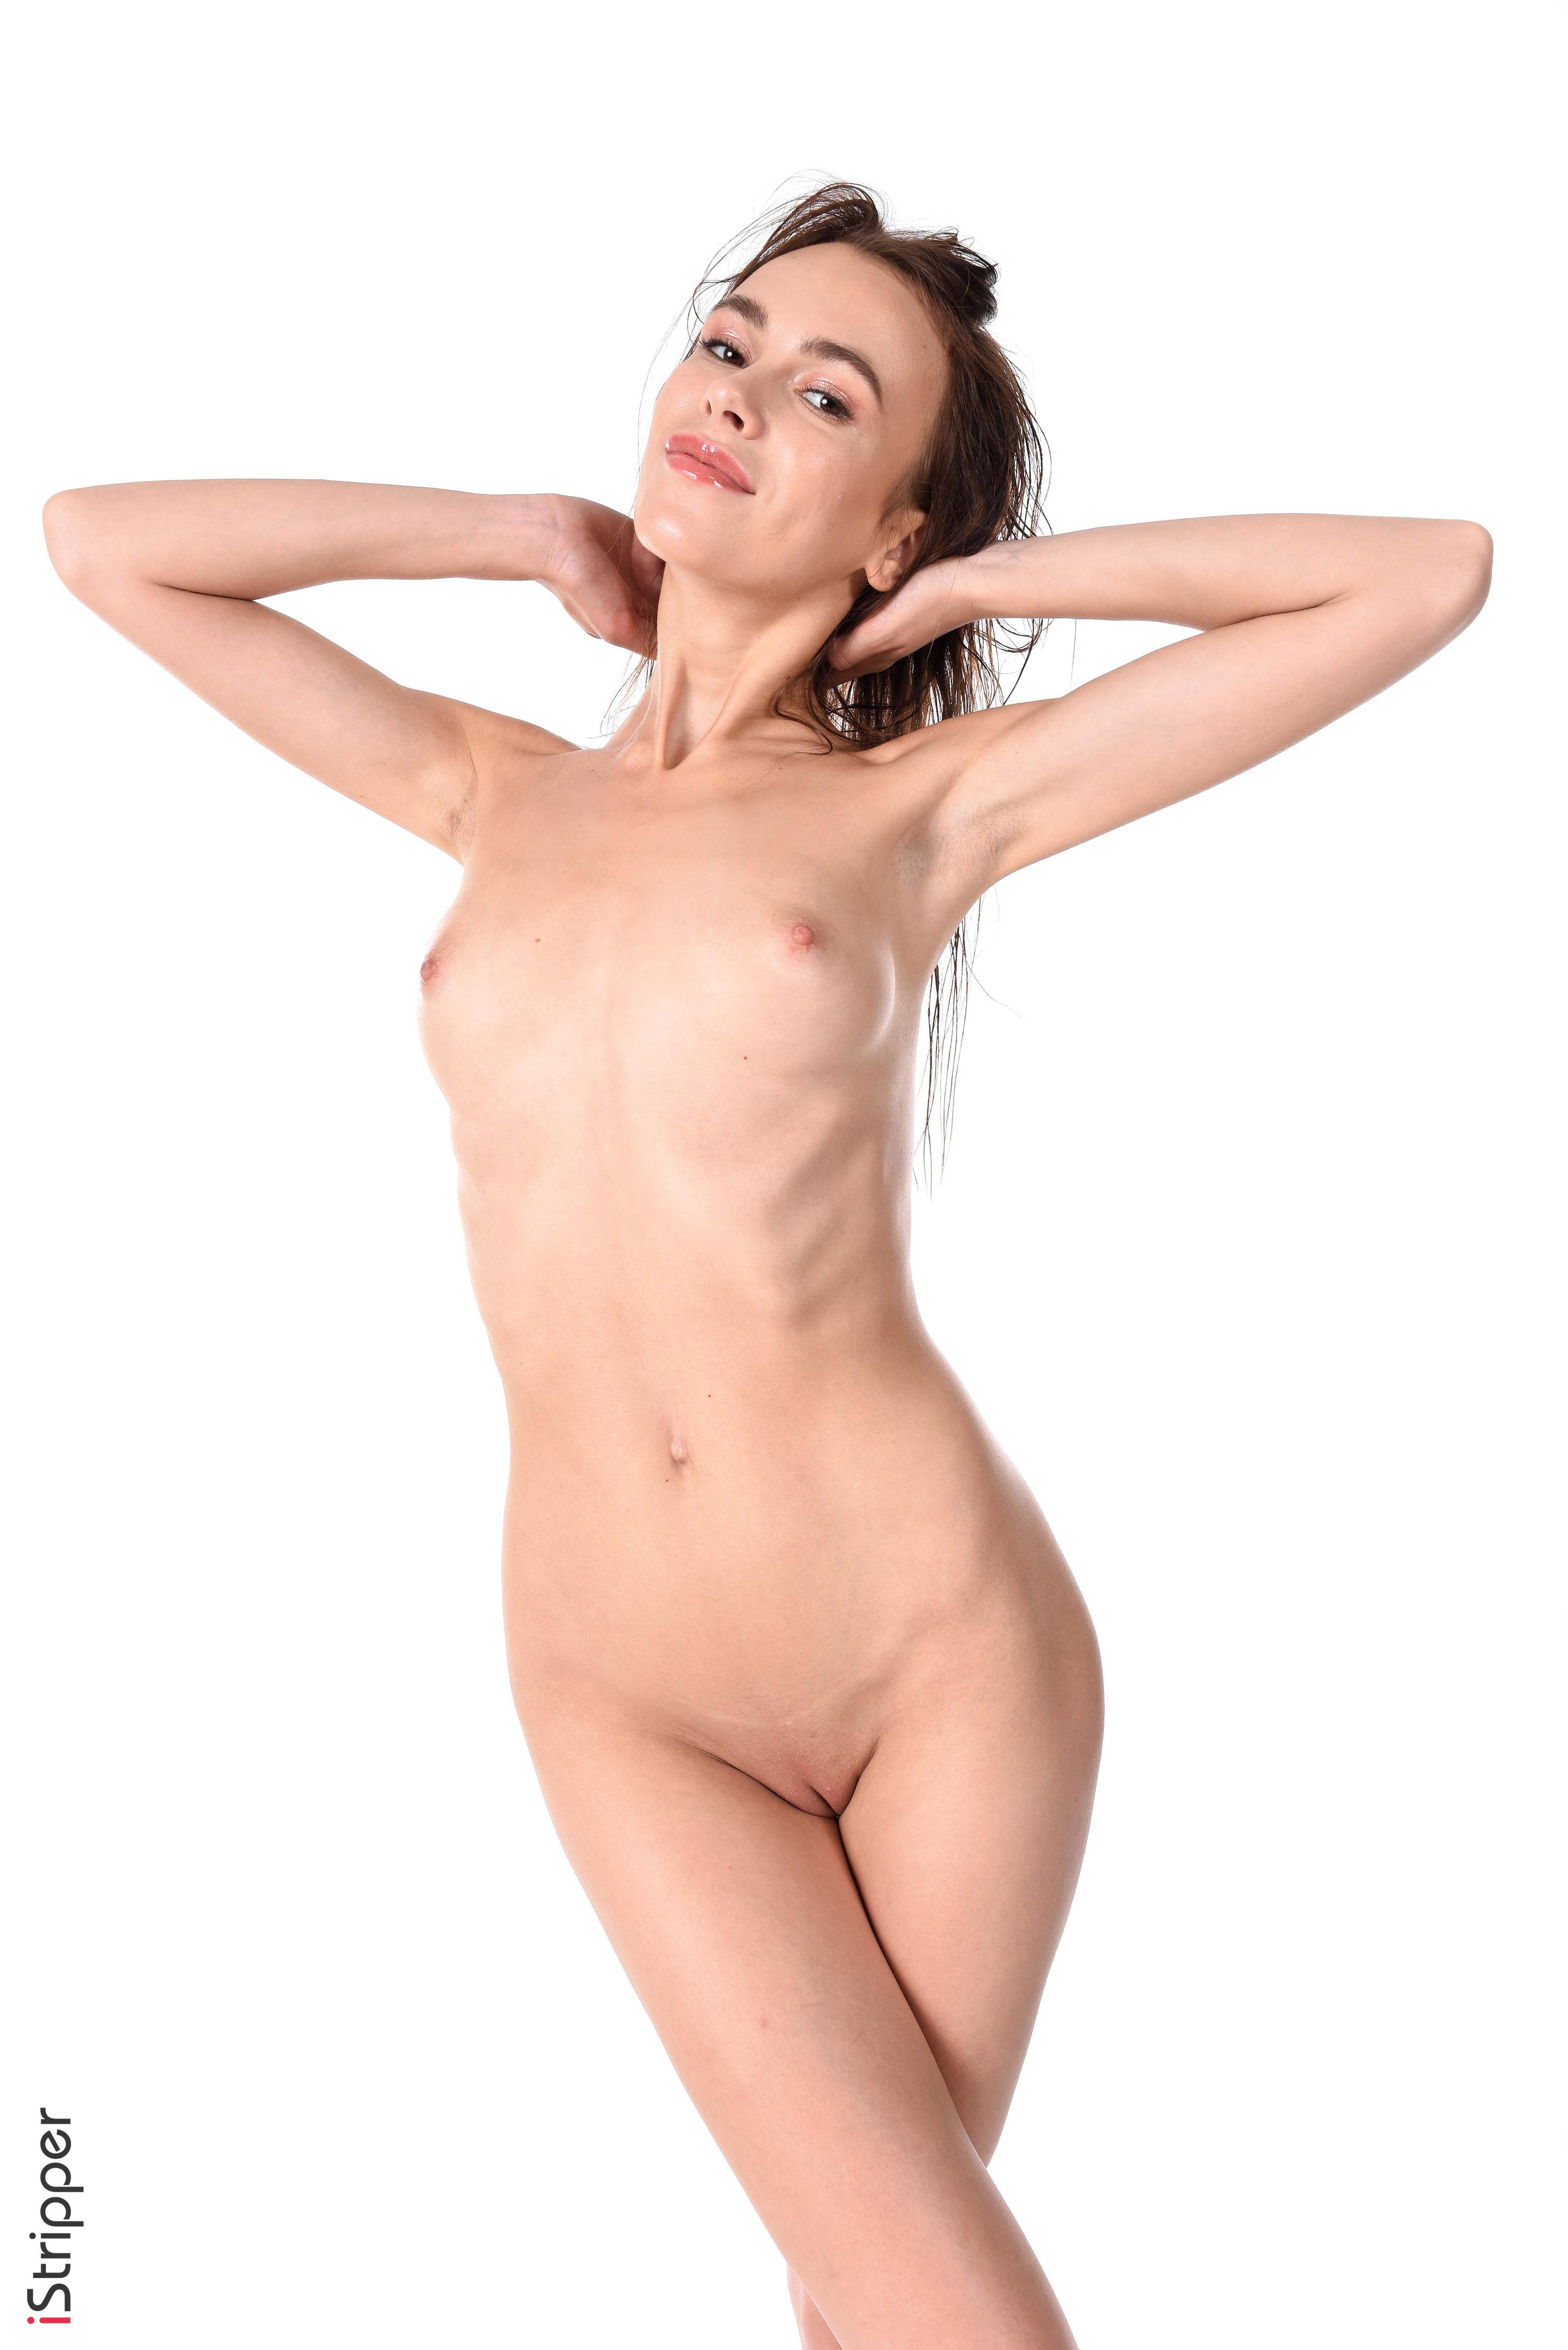 hot Nude Tittied beauties Latin ladies boobed babes wallpaper